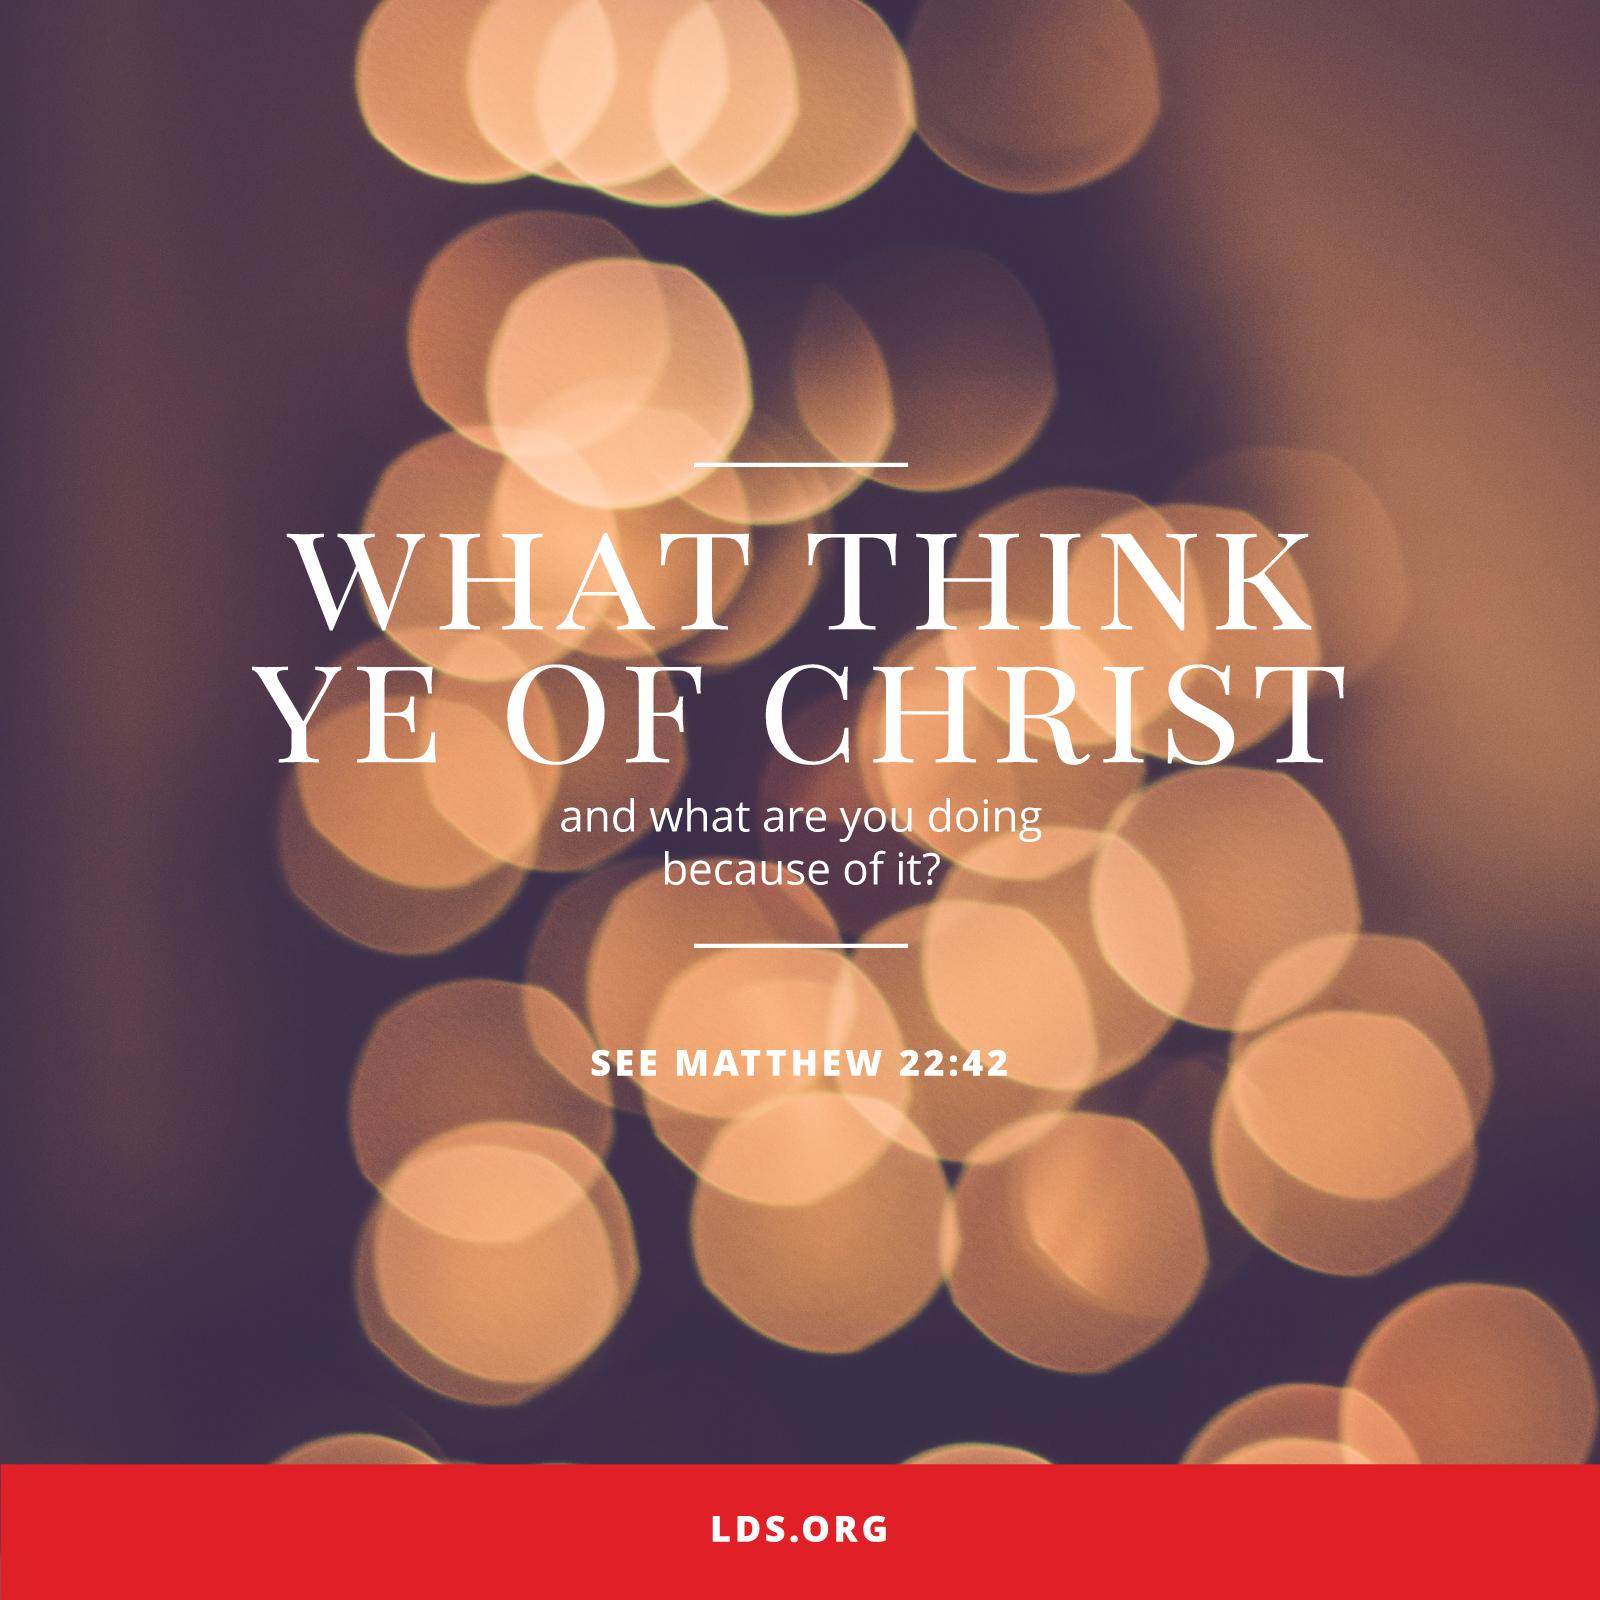 Think of Christ